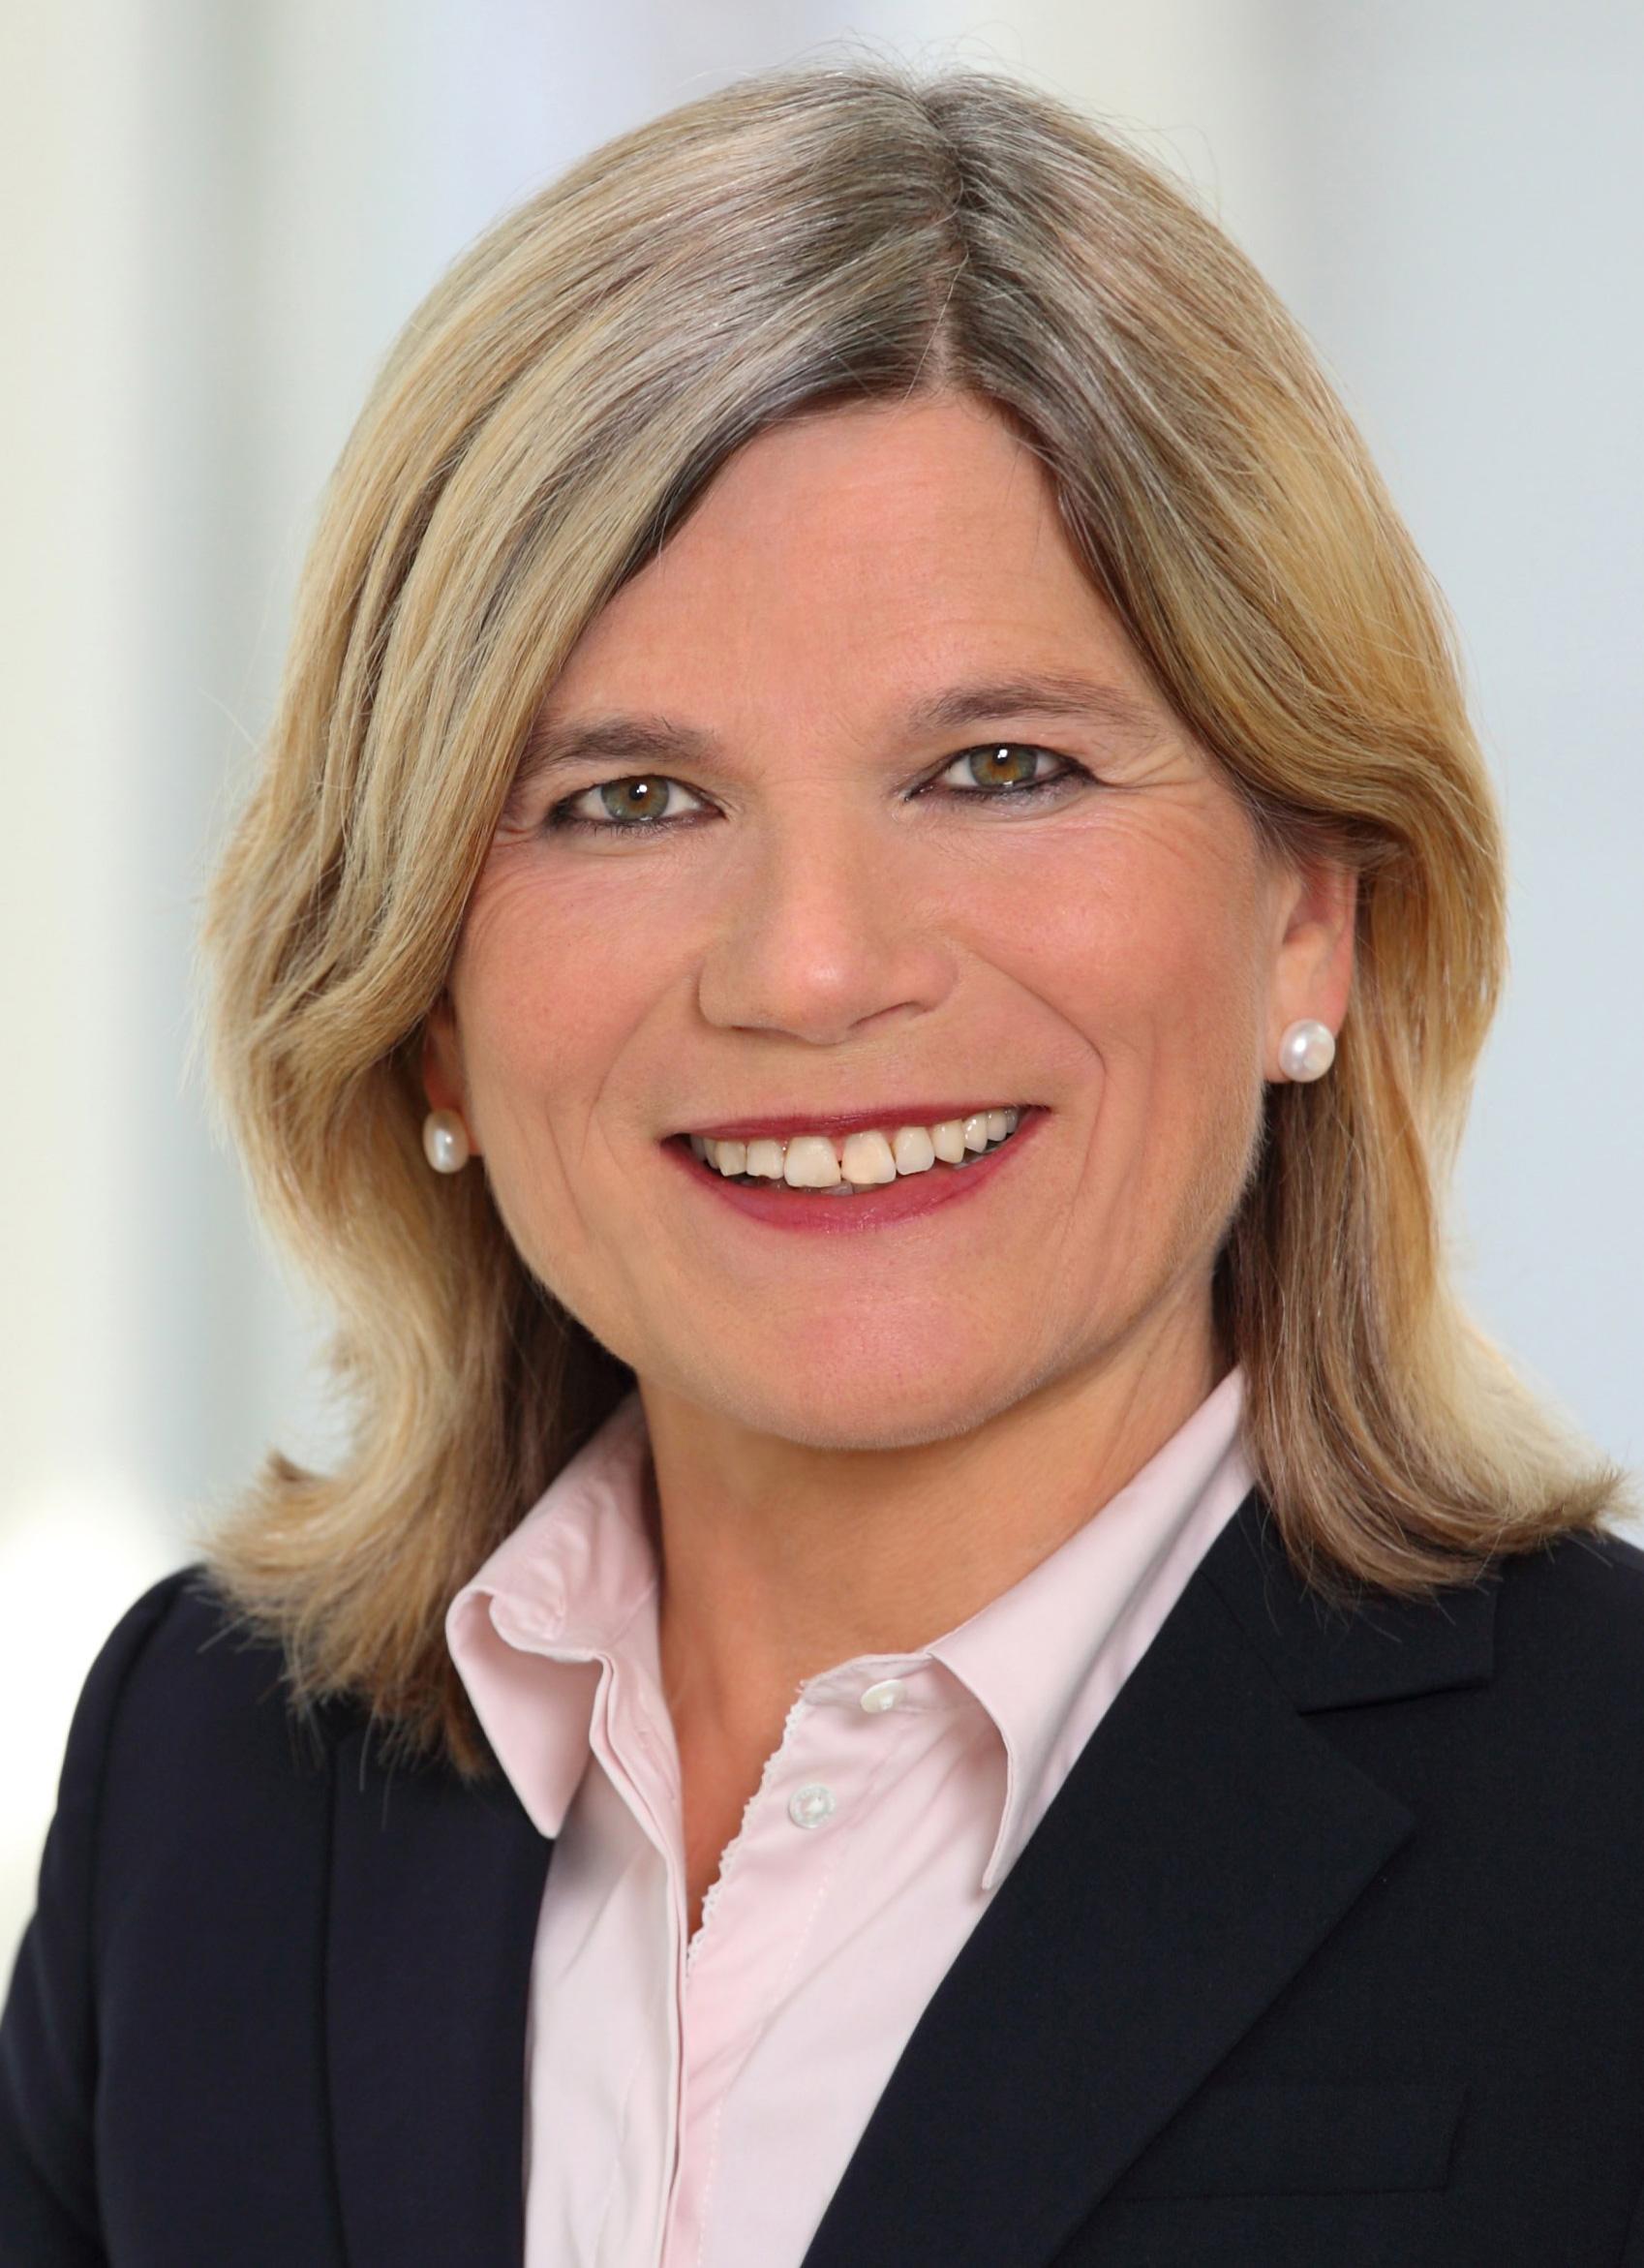 Laurick Bettina